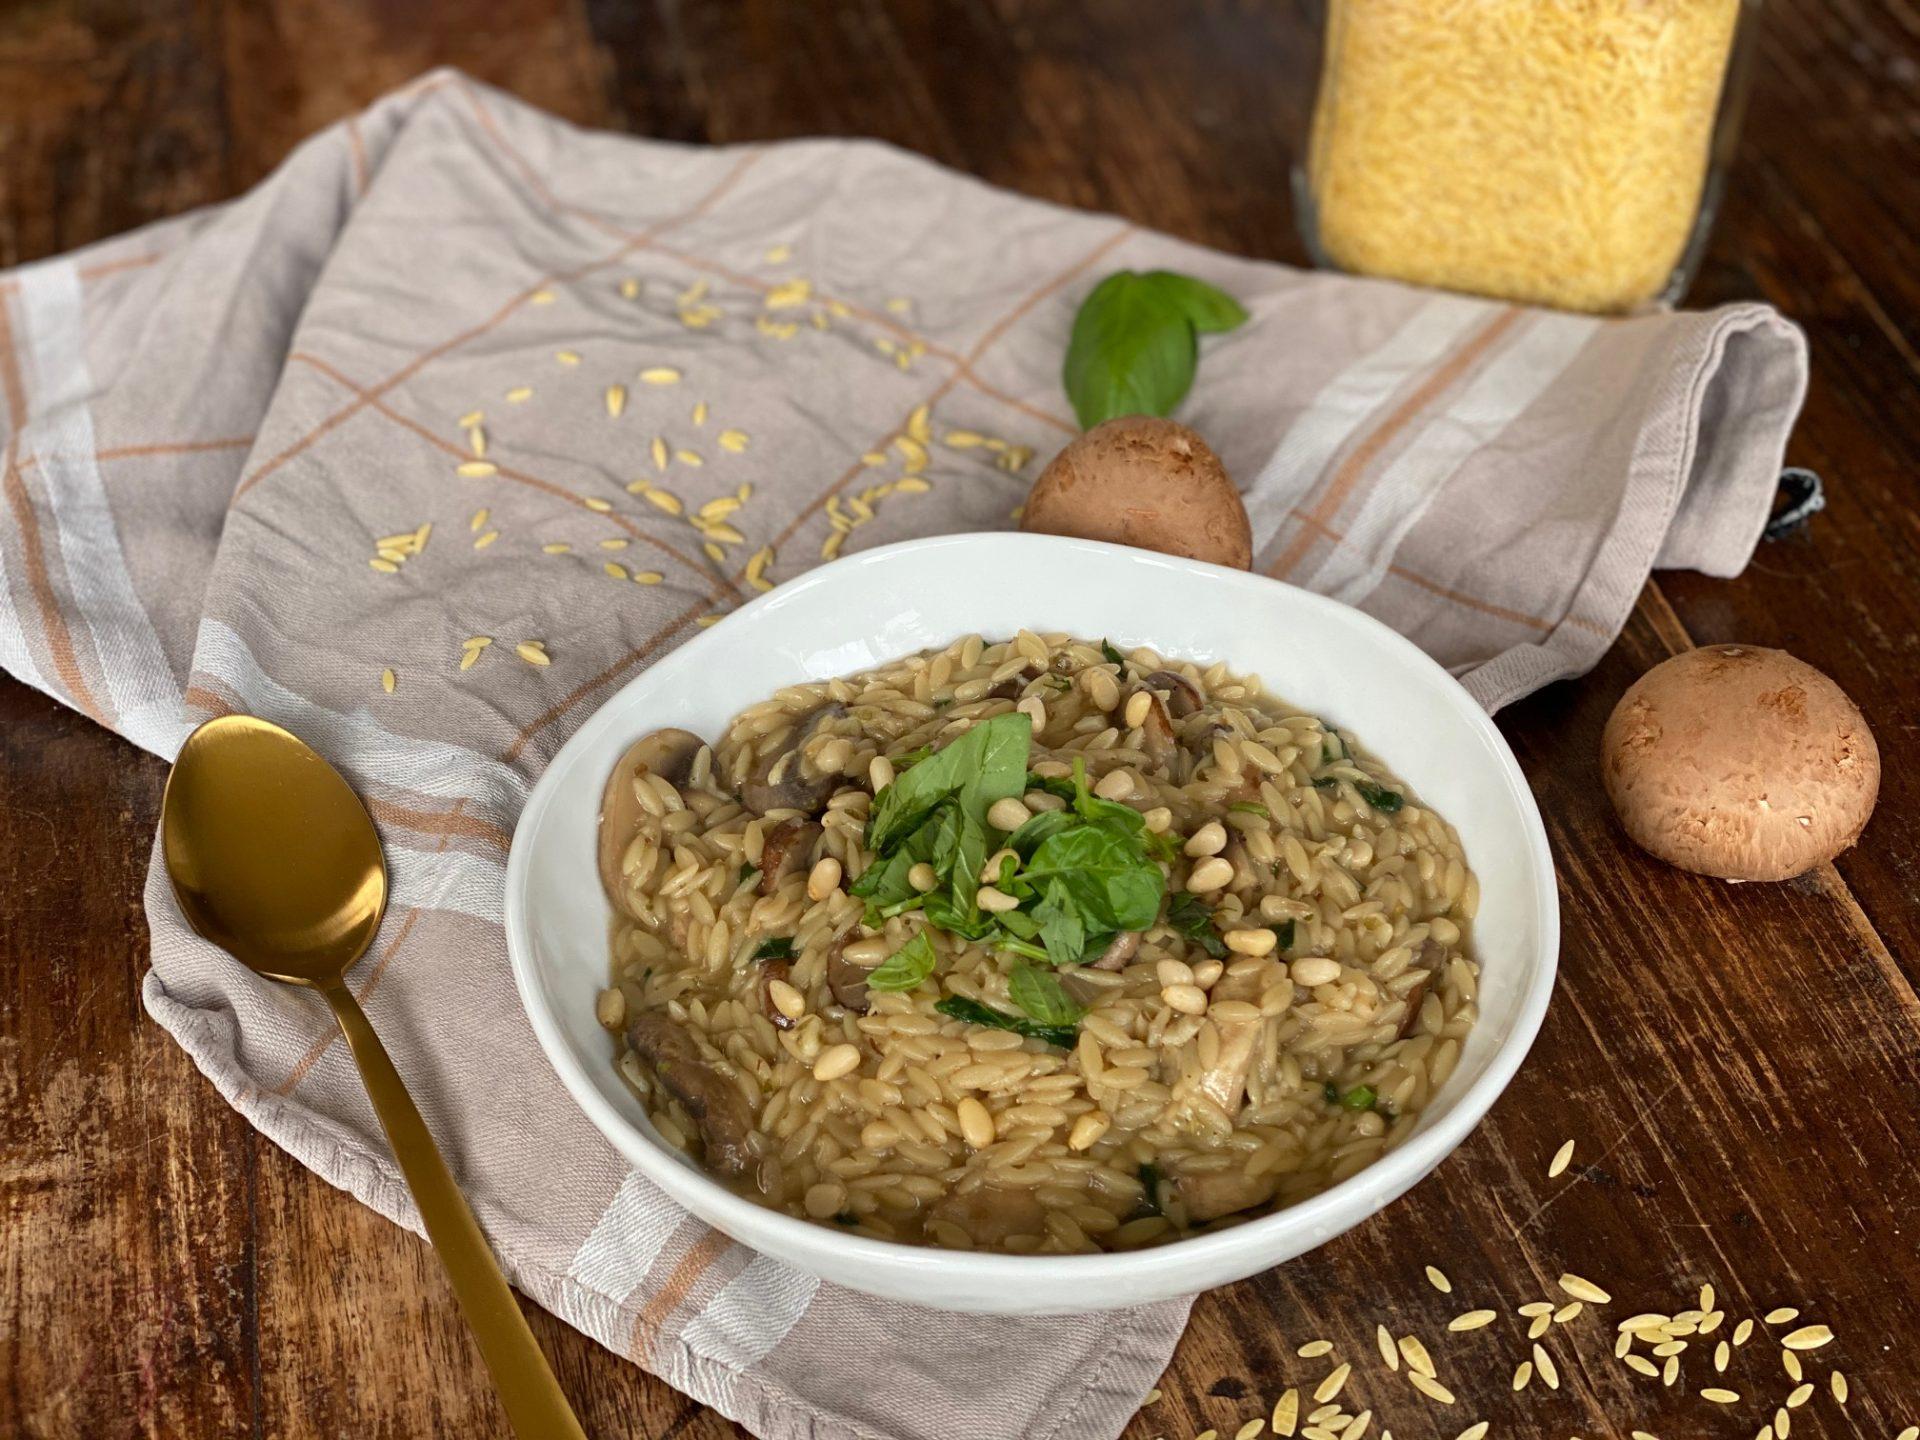 Italiaanse orzo met champignons en bospaddenstoelen - Foodblog Foodinista